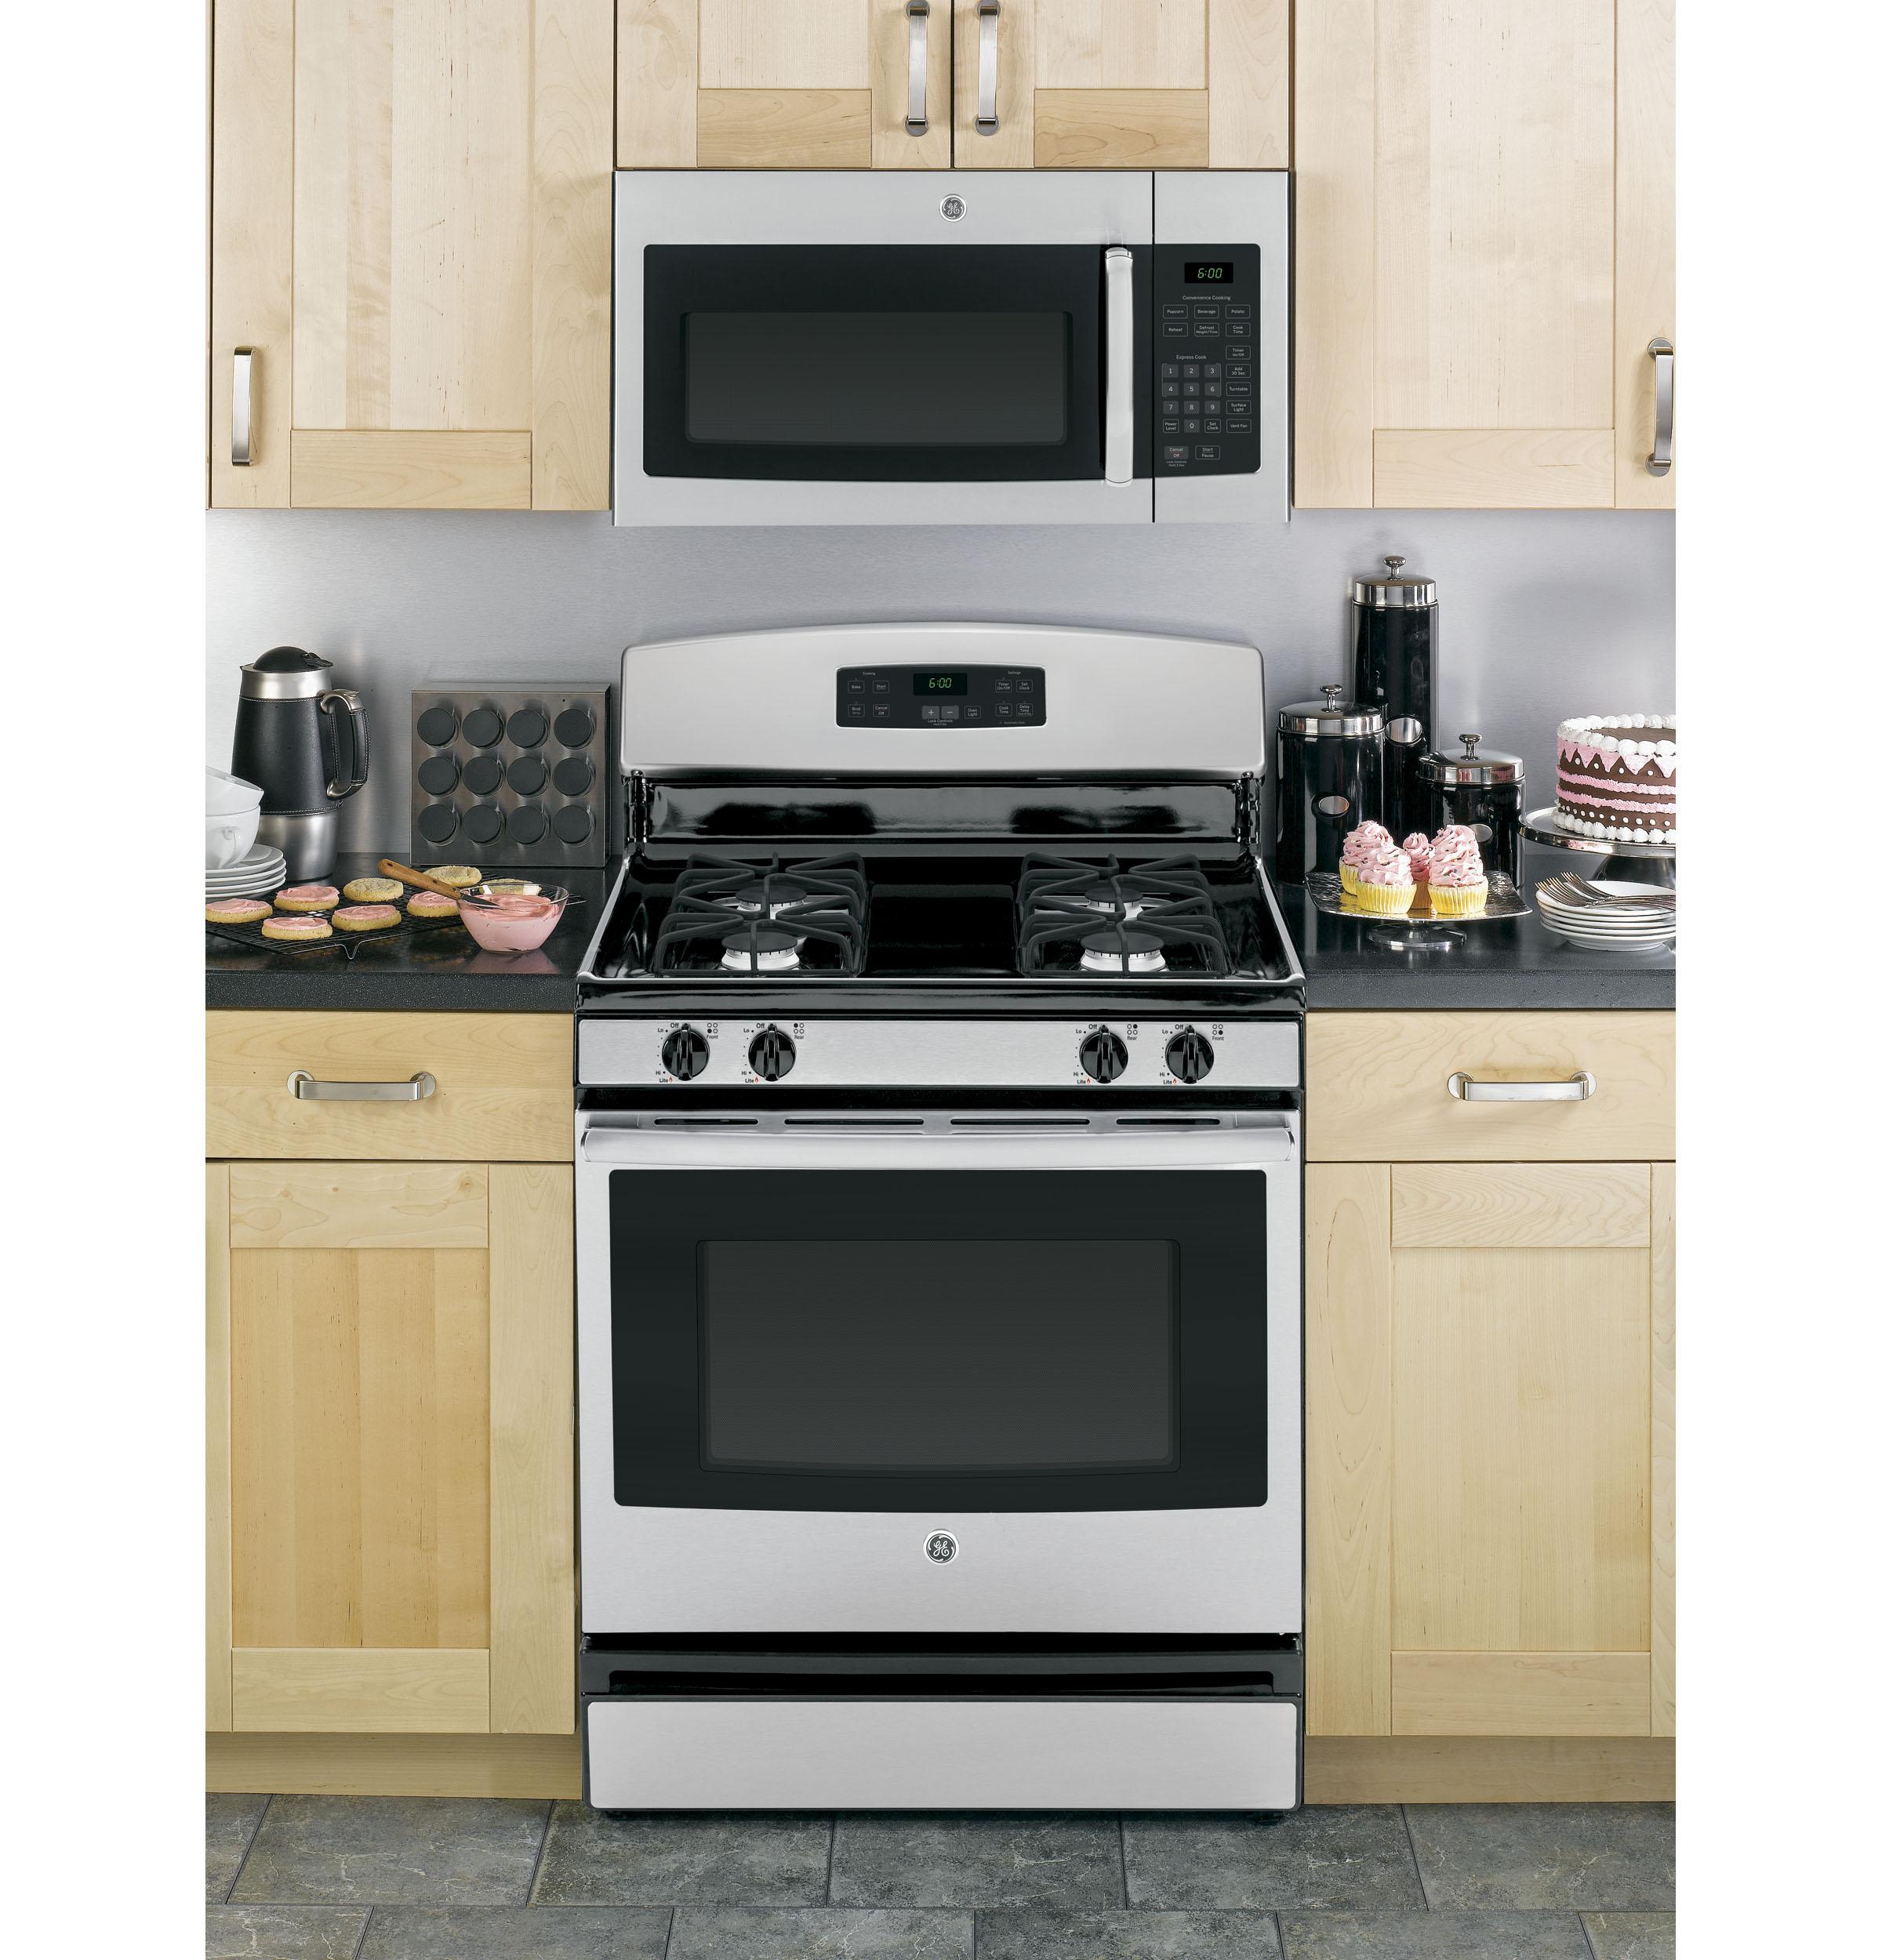 Model: JVM3160RFSS | GE GE® 1.6 Cu. Ft. Over-the-Range Microwave Oven